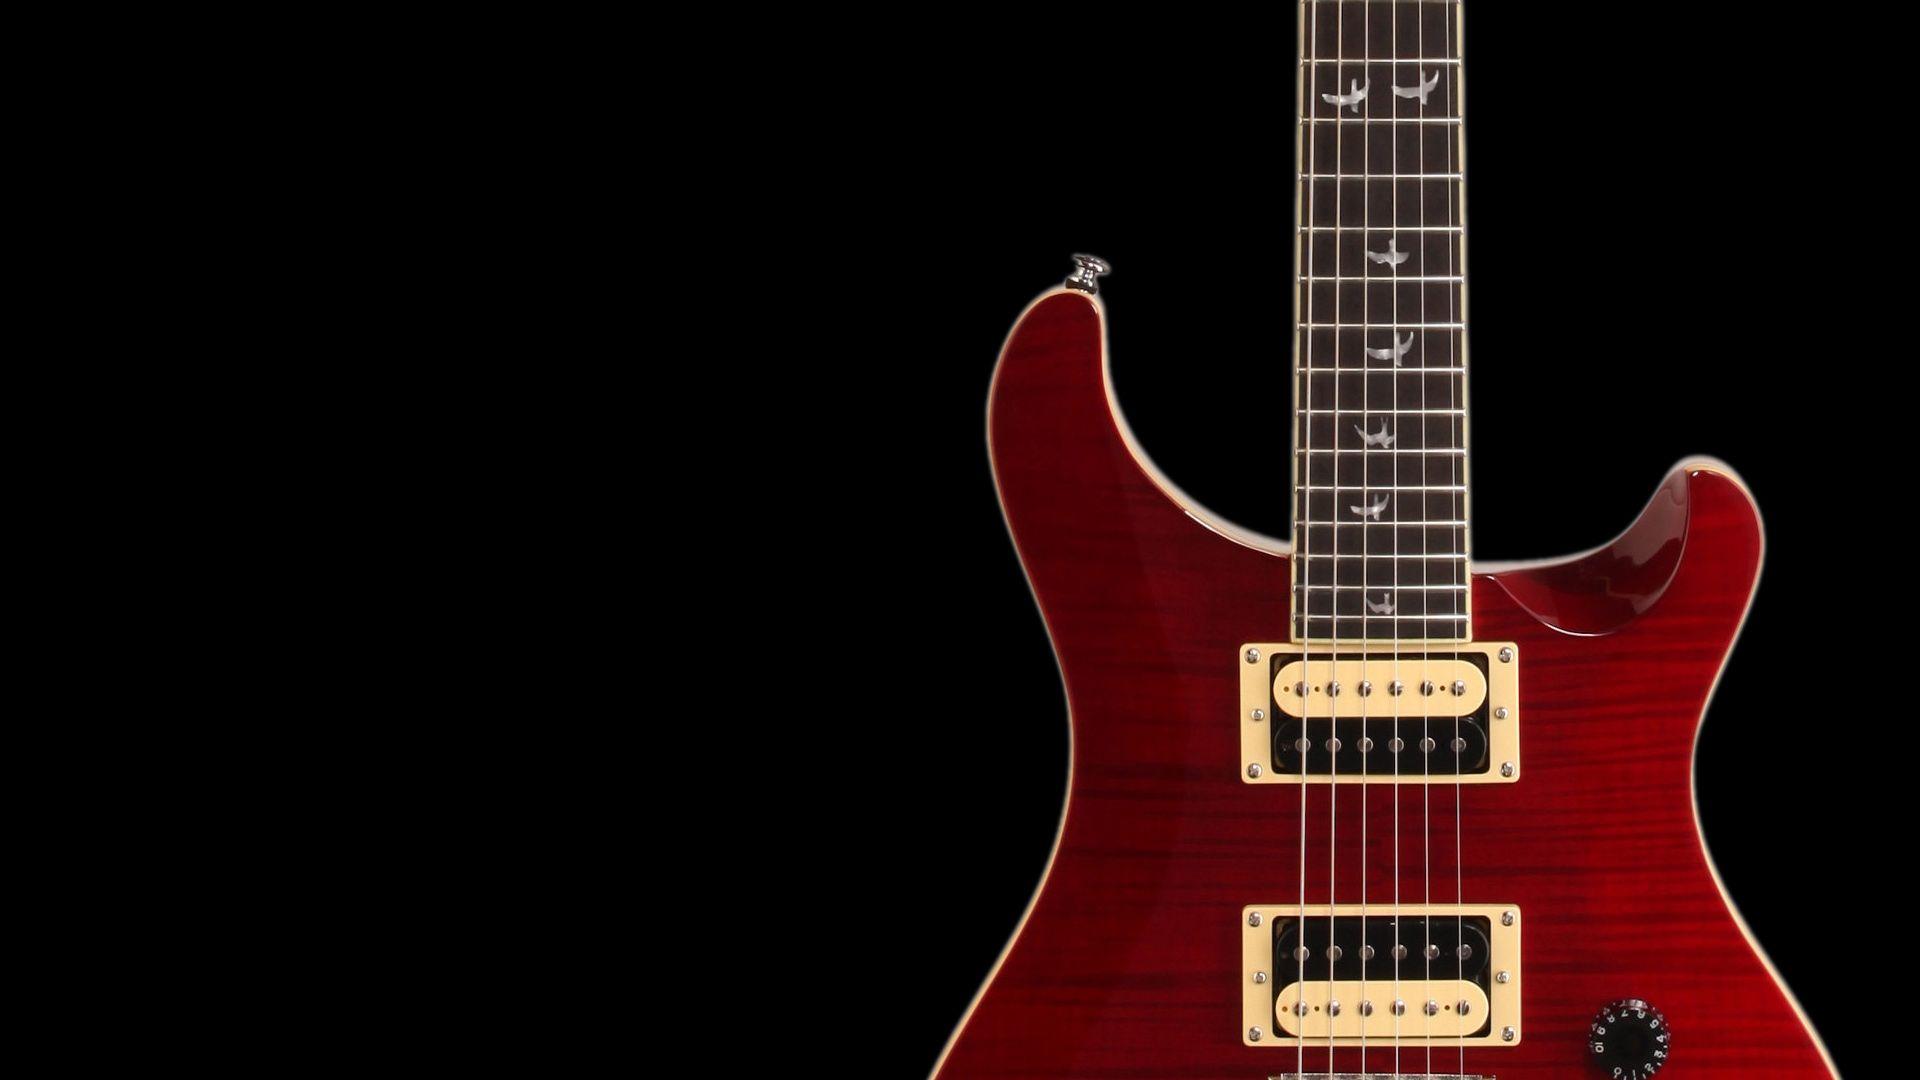 Electric Guitar red, Cool Wallpaper